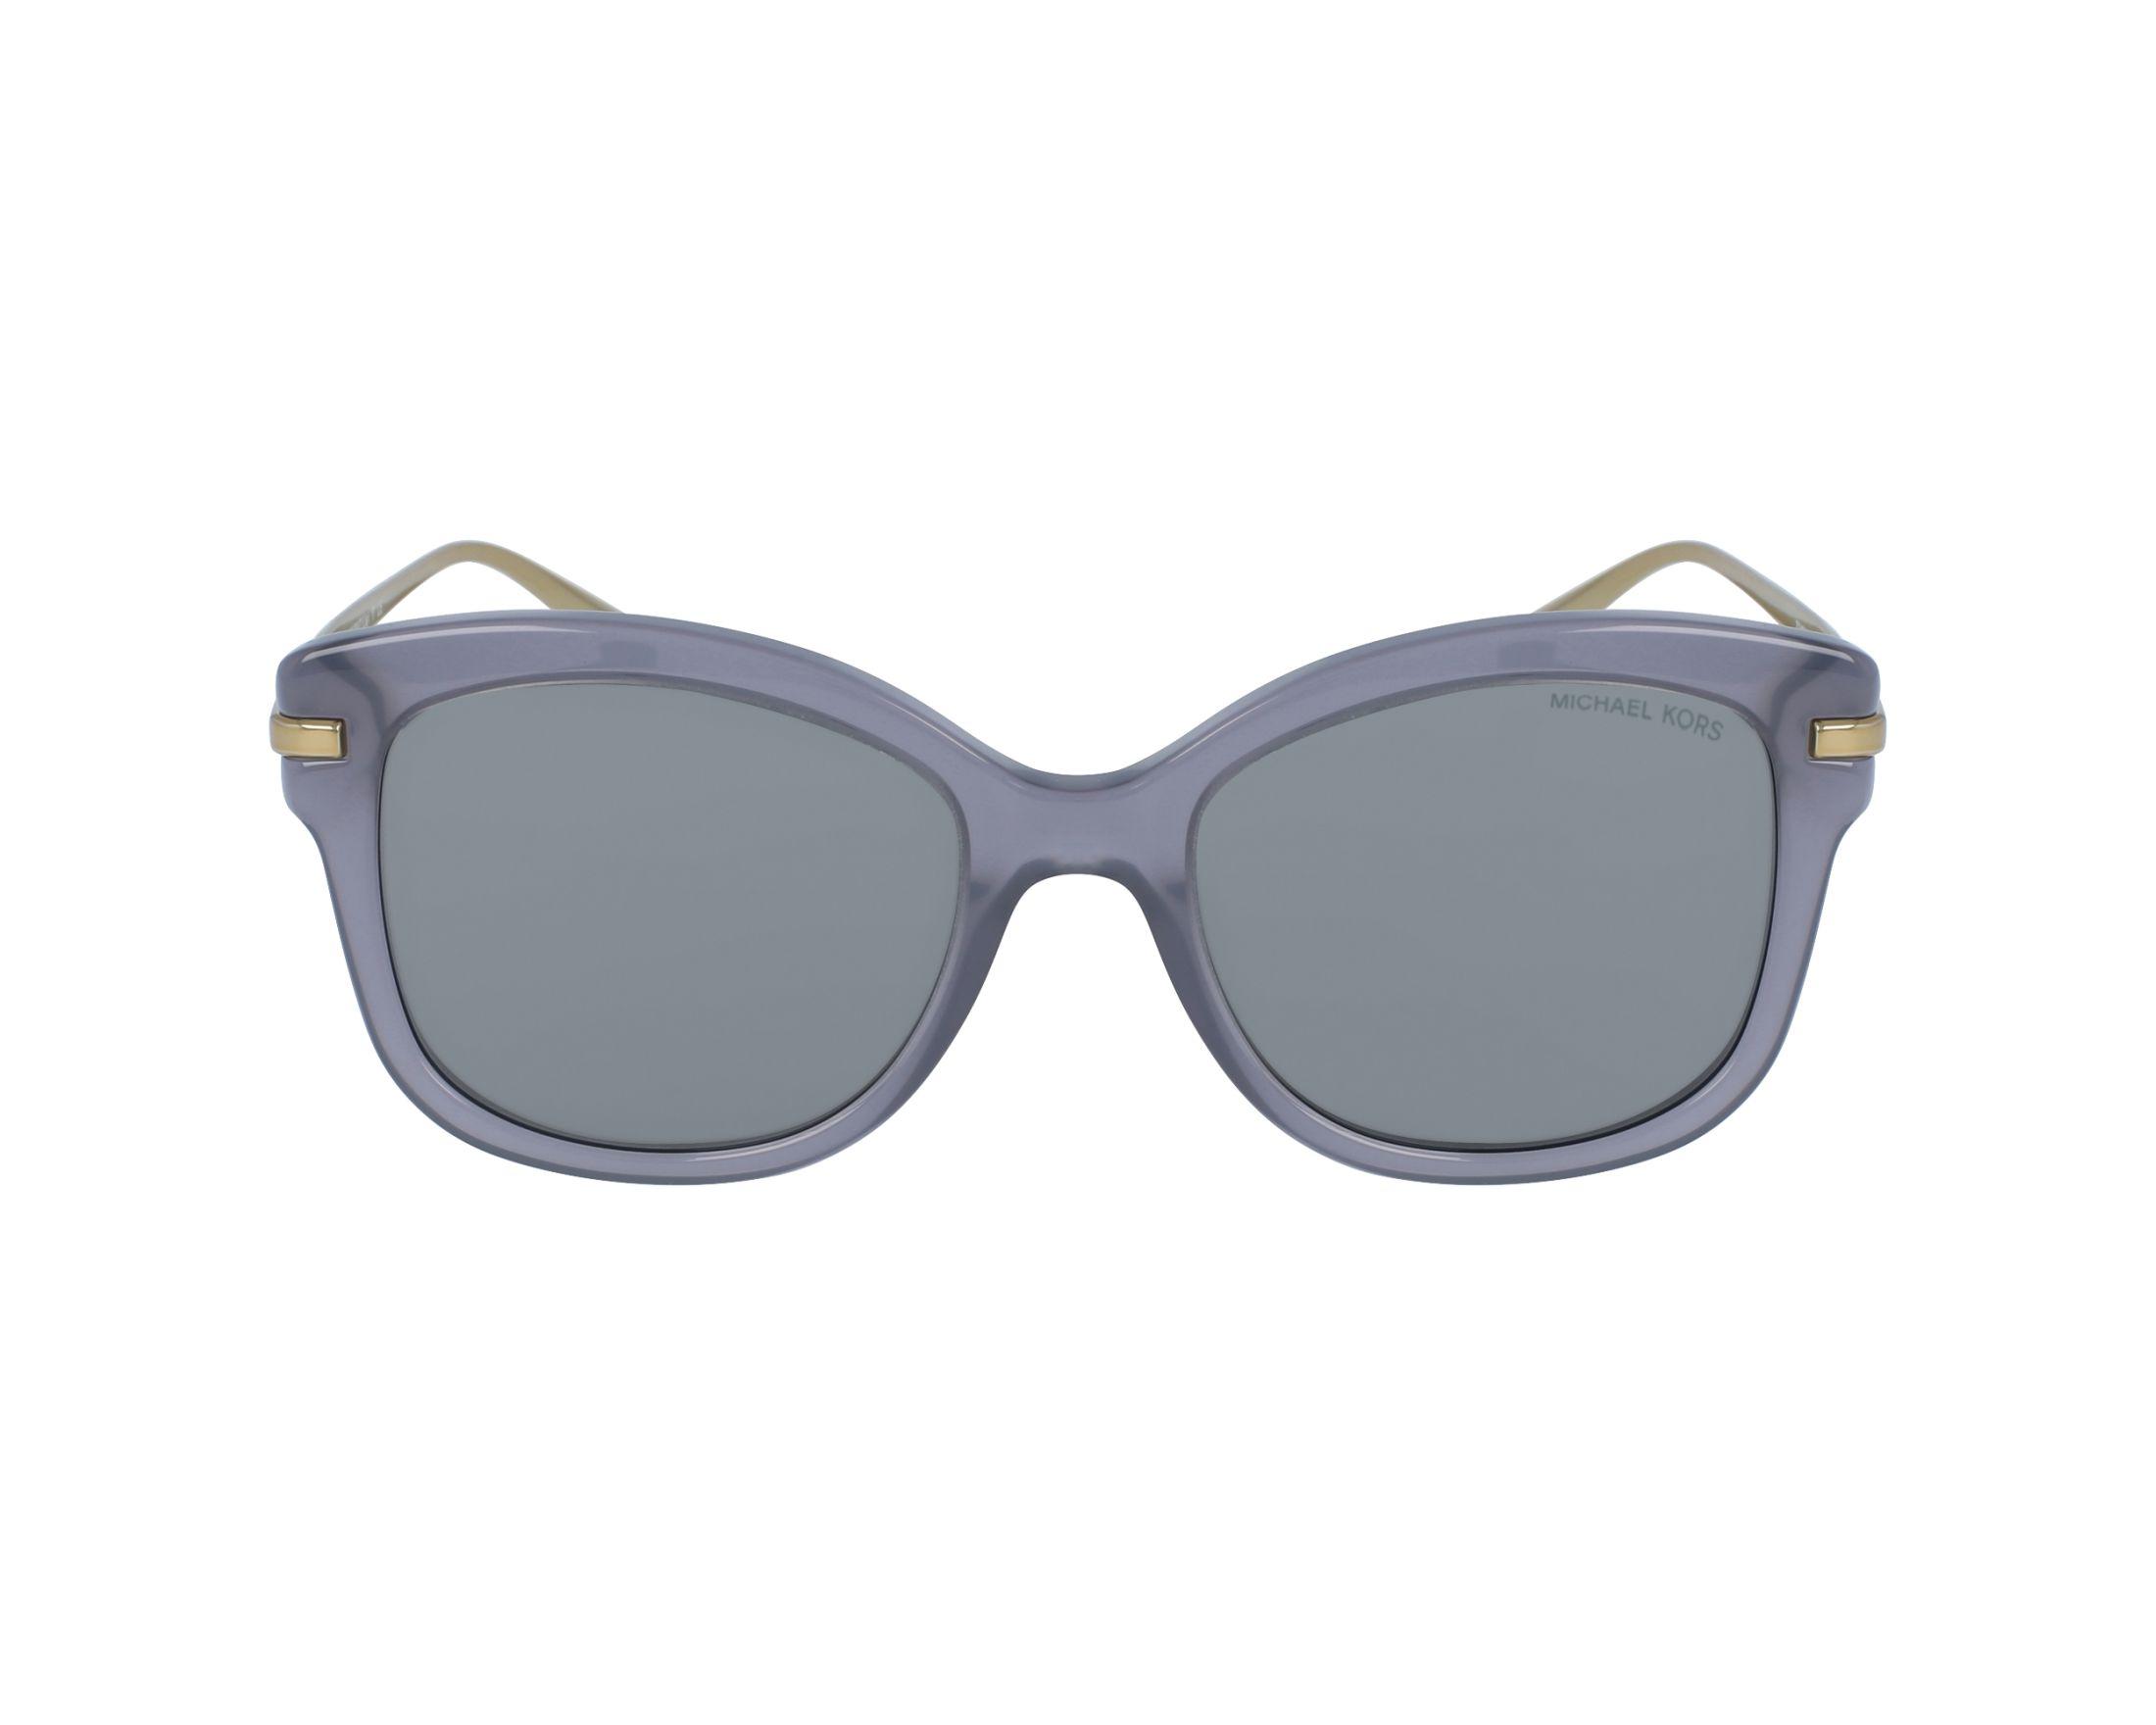 1634d57fe5 Sunglasses Michael Kors MK-2047 32456G 53-18 Blue Gold profile view